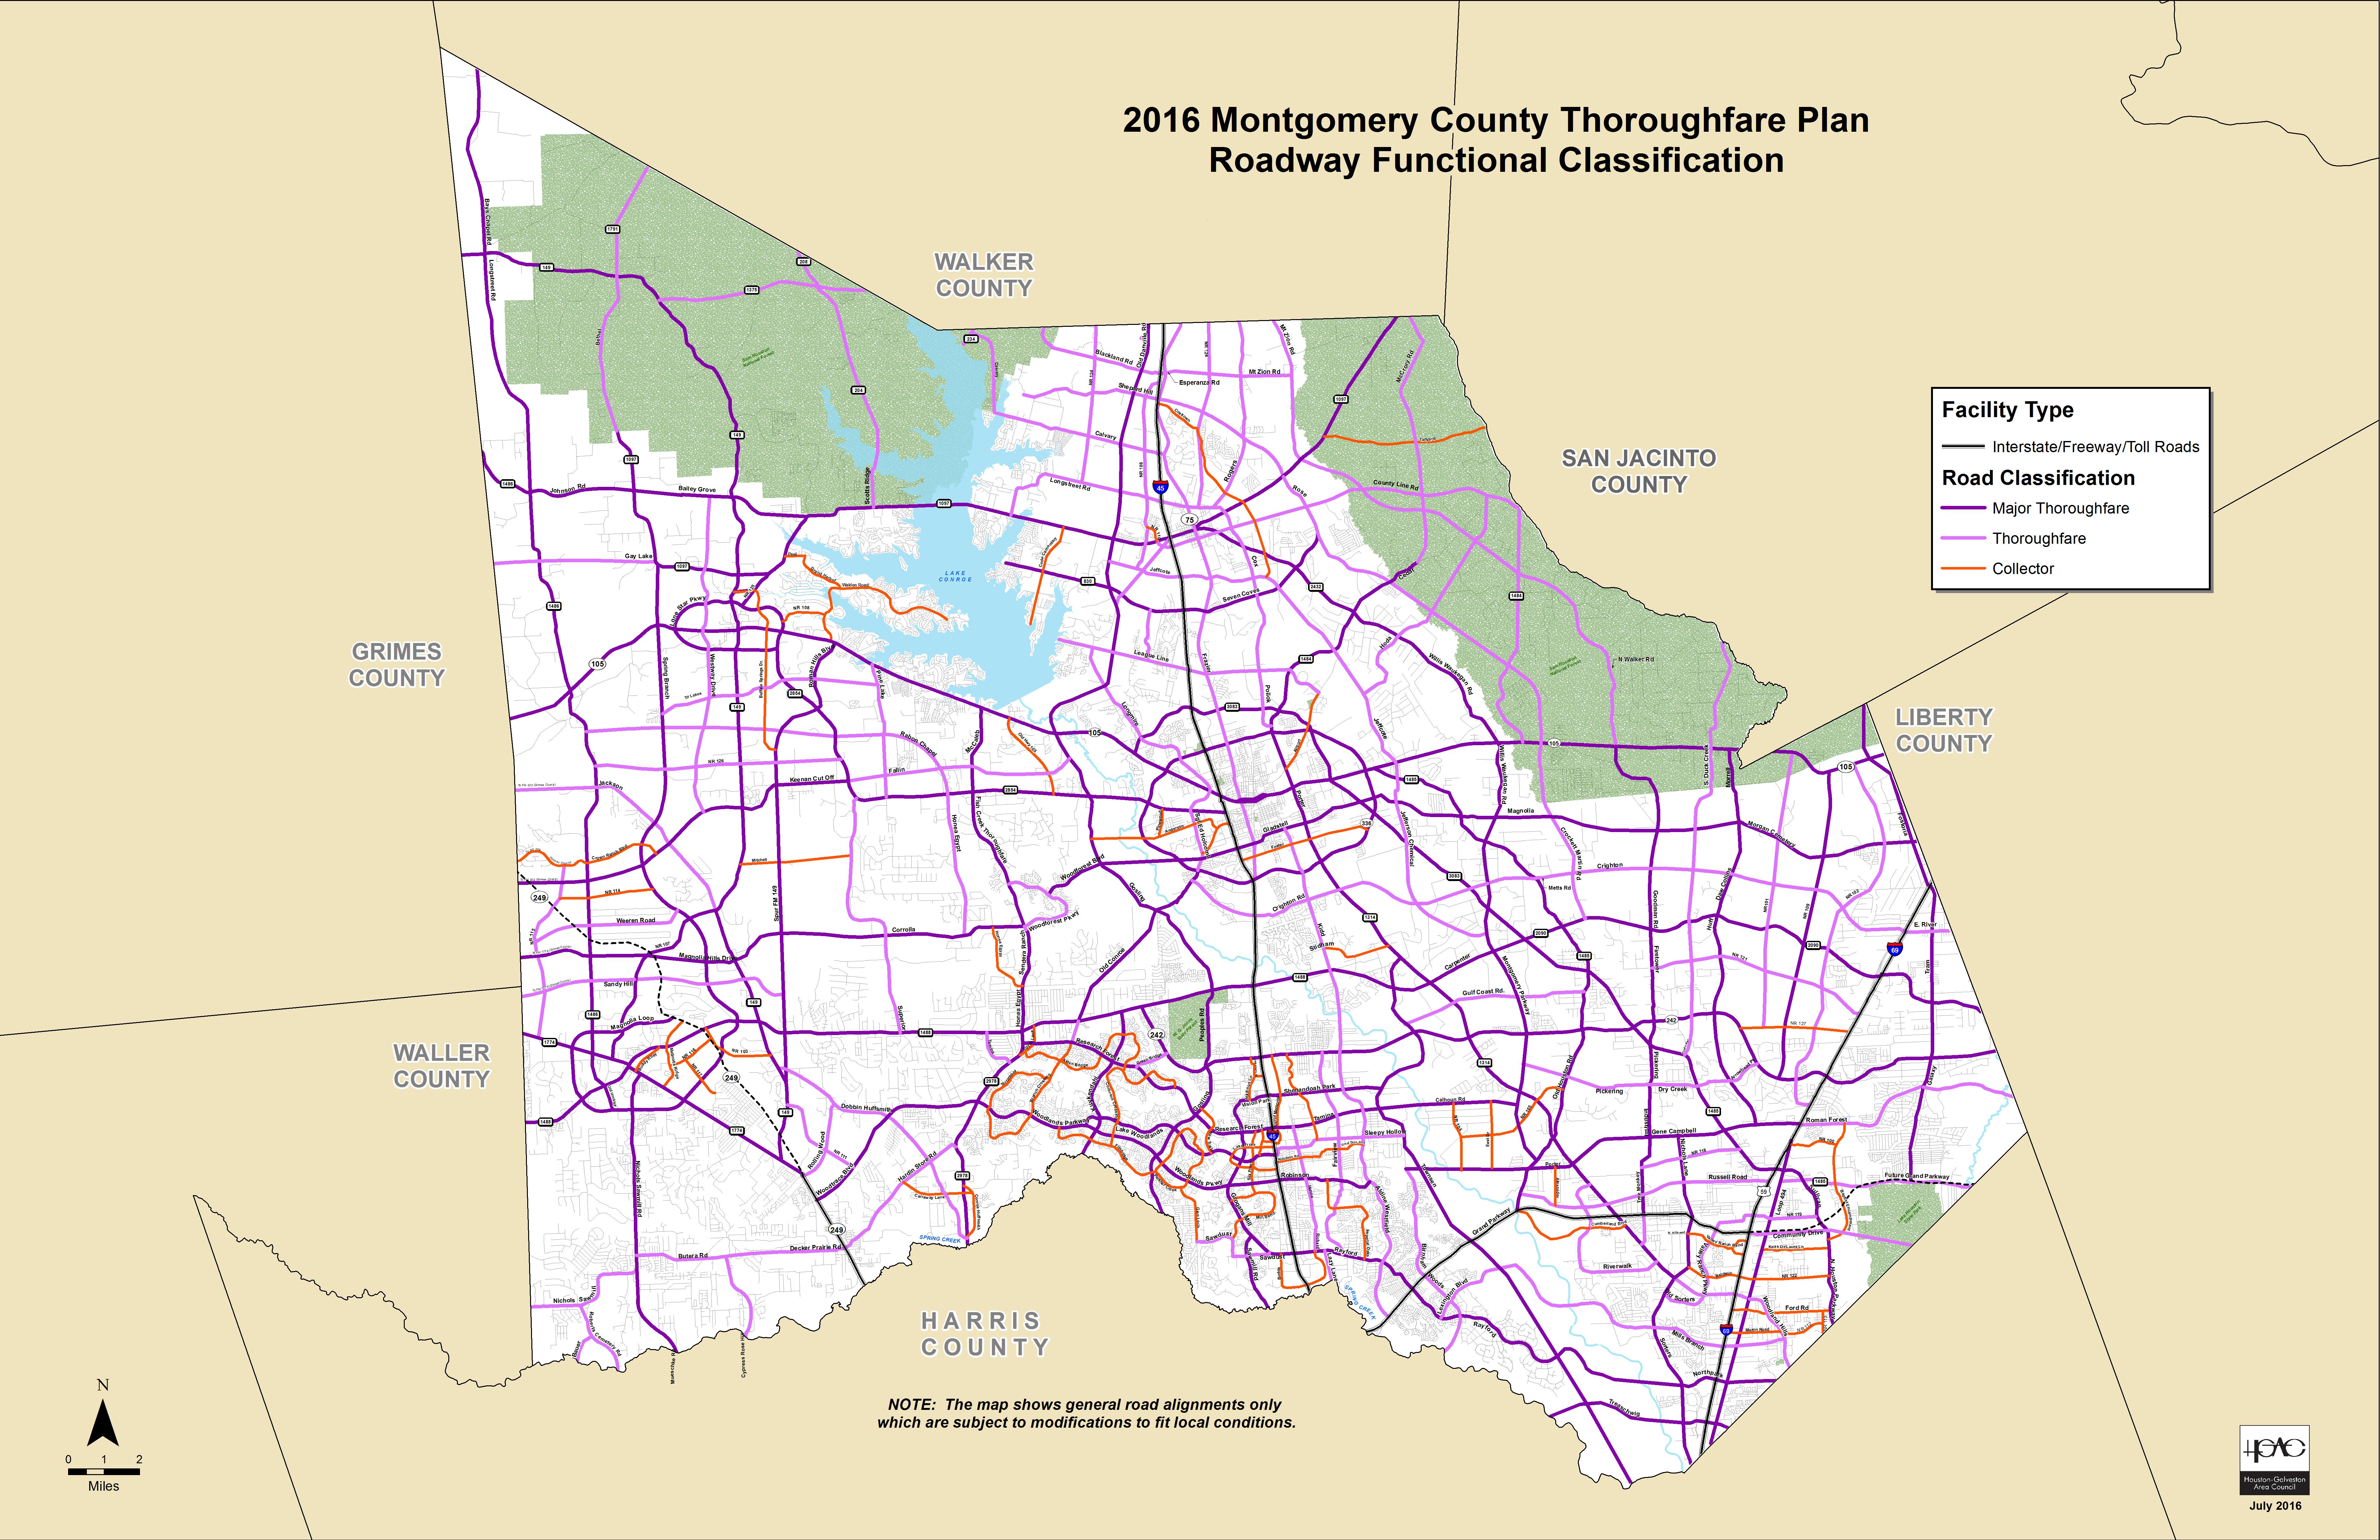 Fema Floodplain Maps Dfirm Federal Emergency Management Agency - Conroe Texas Flooding Map